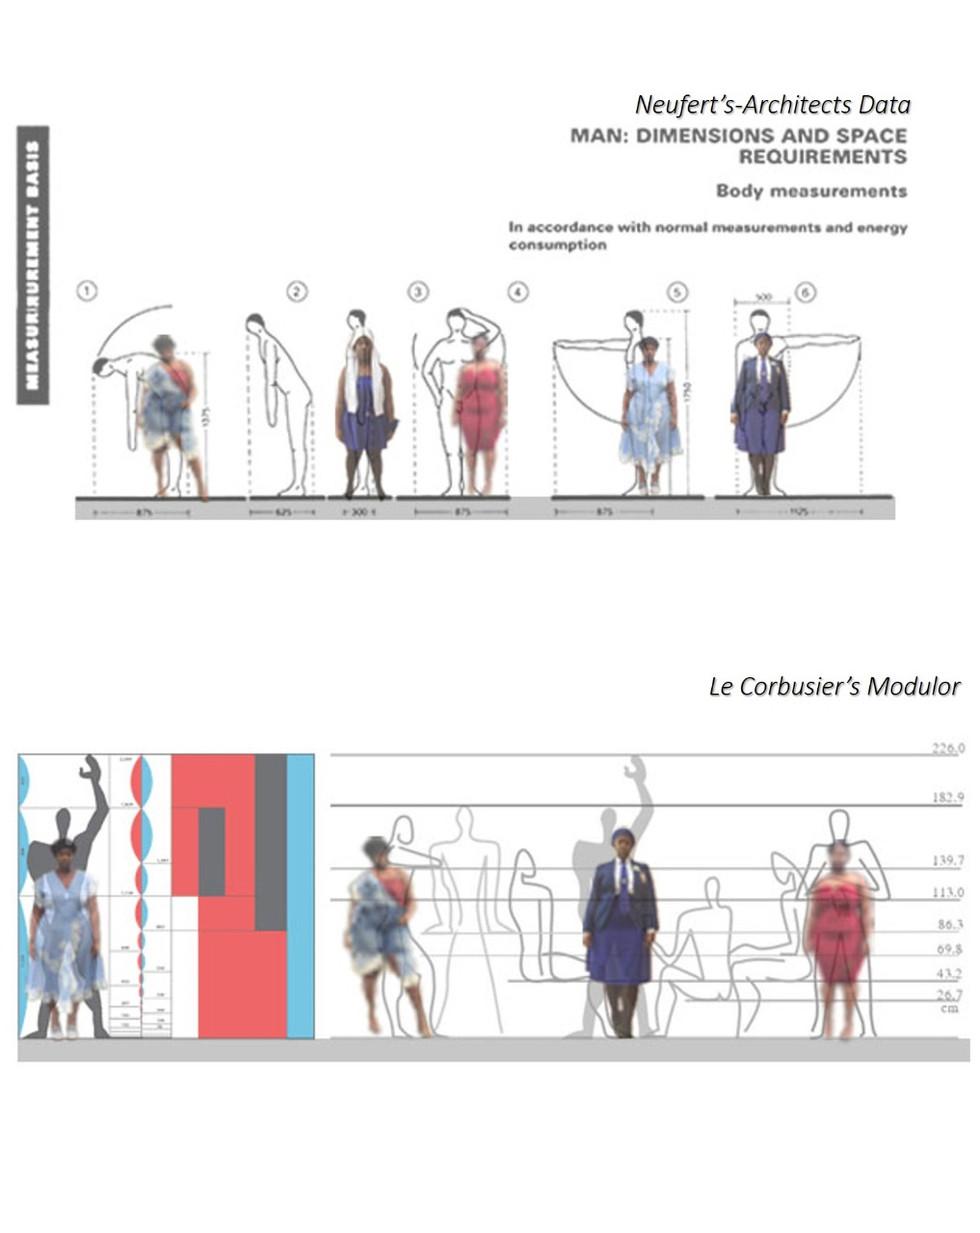 Neufert's-Architects Data. Vilakazi, M. Unit 13. 2020.